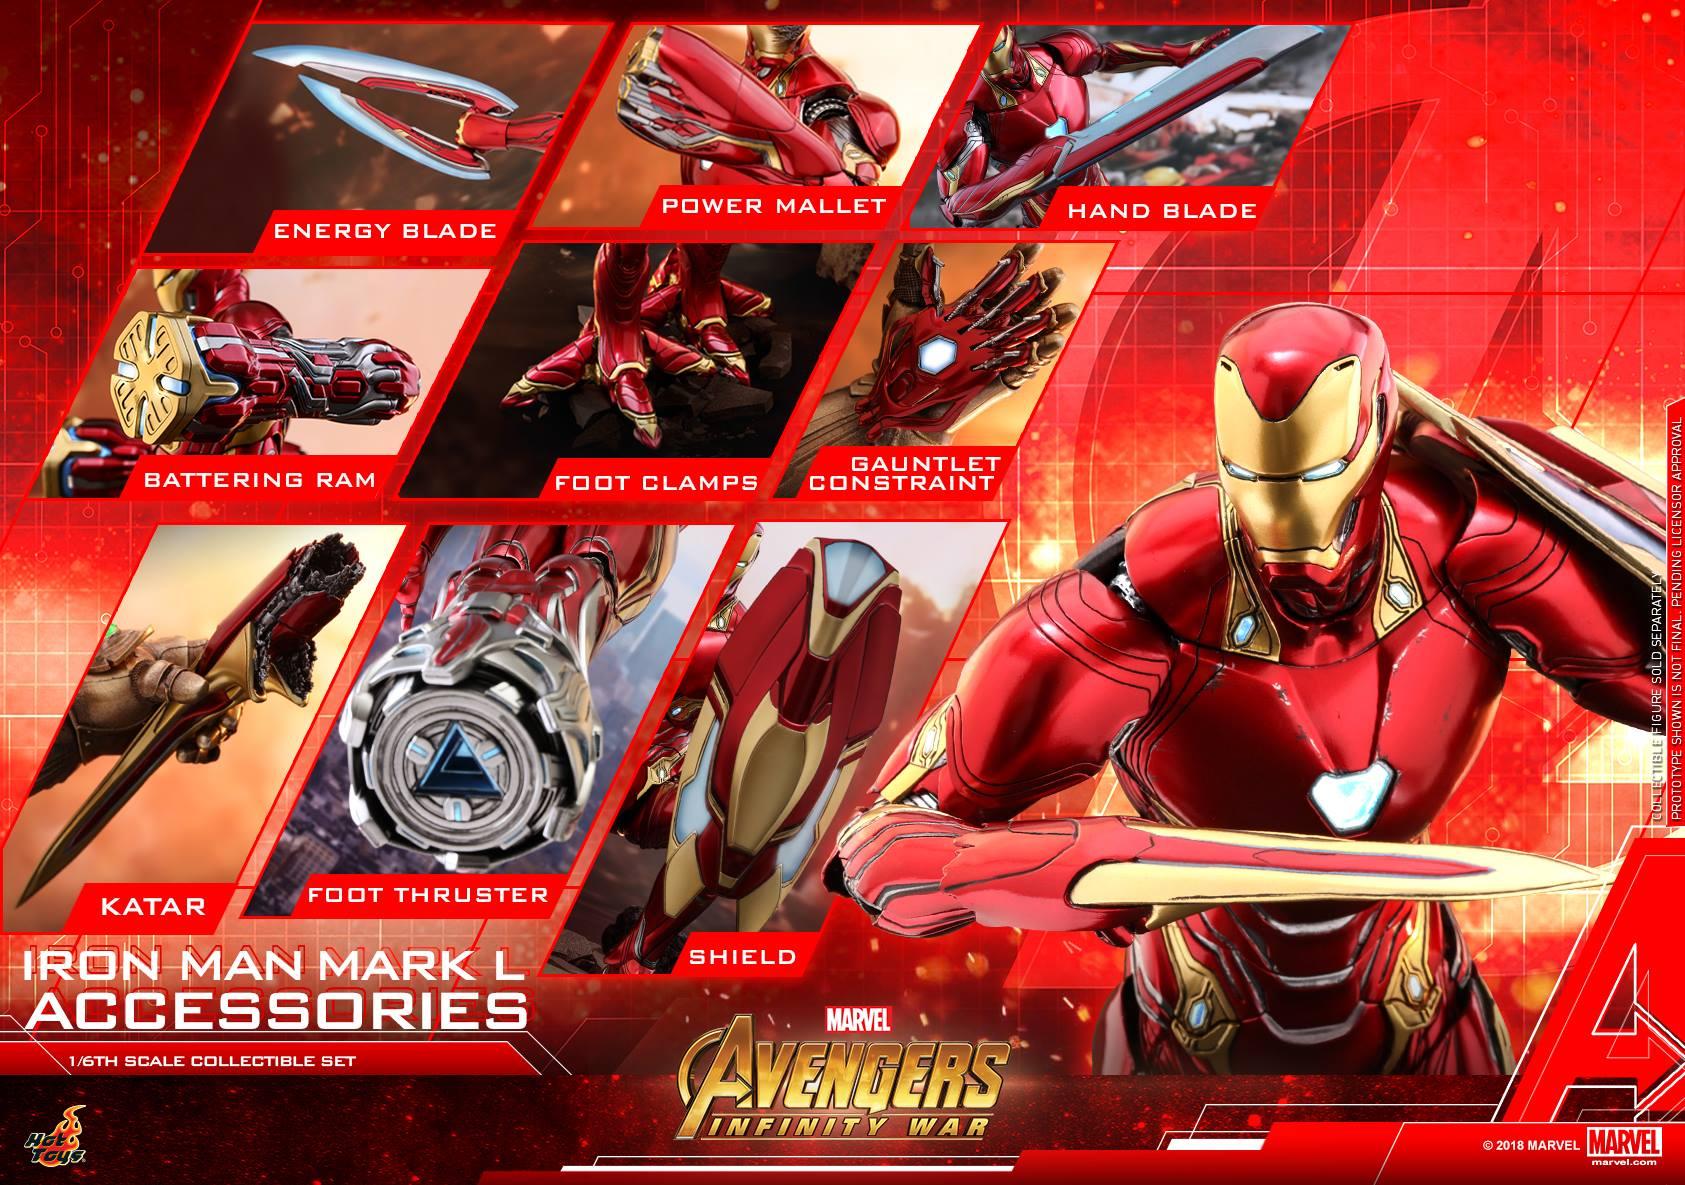 Avengers - Infinity Wars - Iron Man Mark L (50) 1/6 (Hot Toys) JlIYZAK2_o